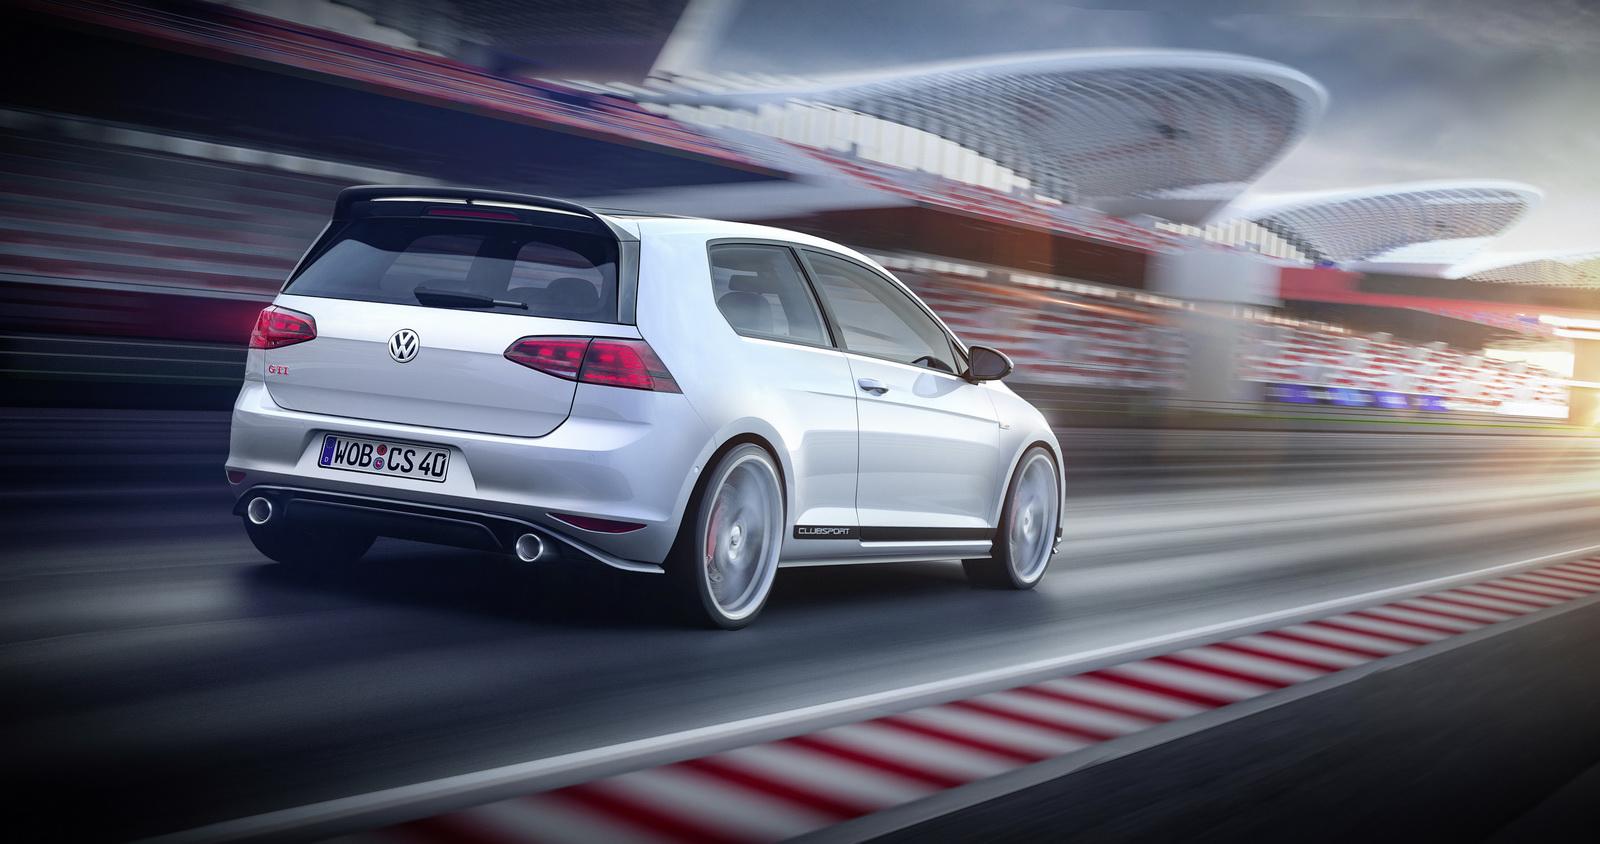 Gallery Volkswagen Golf GTI Clubsport Concept - 8 photos - GTspirit